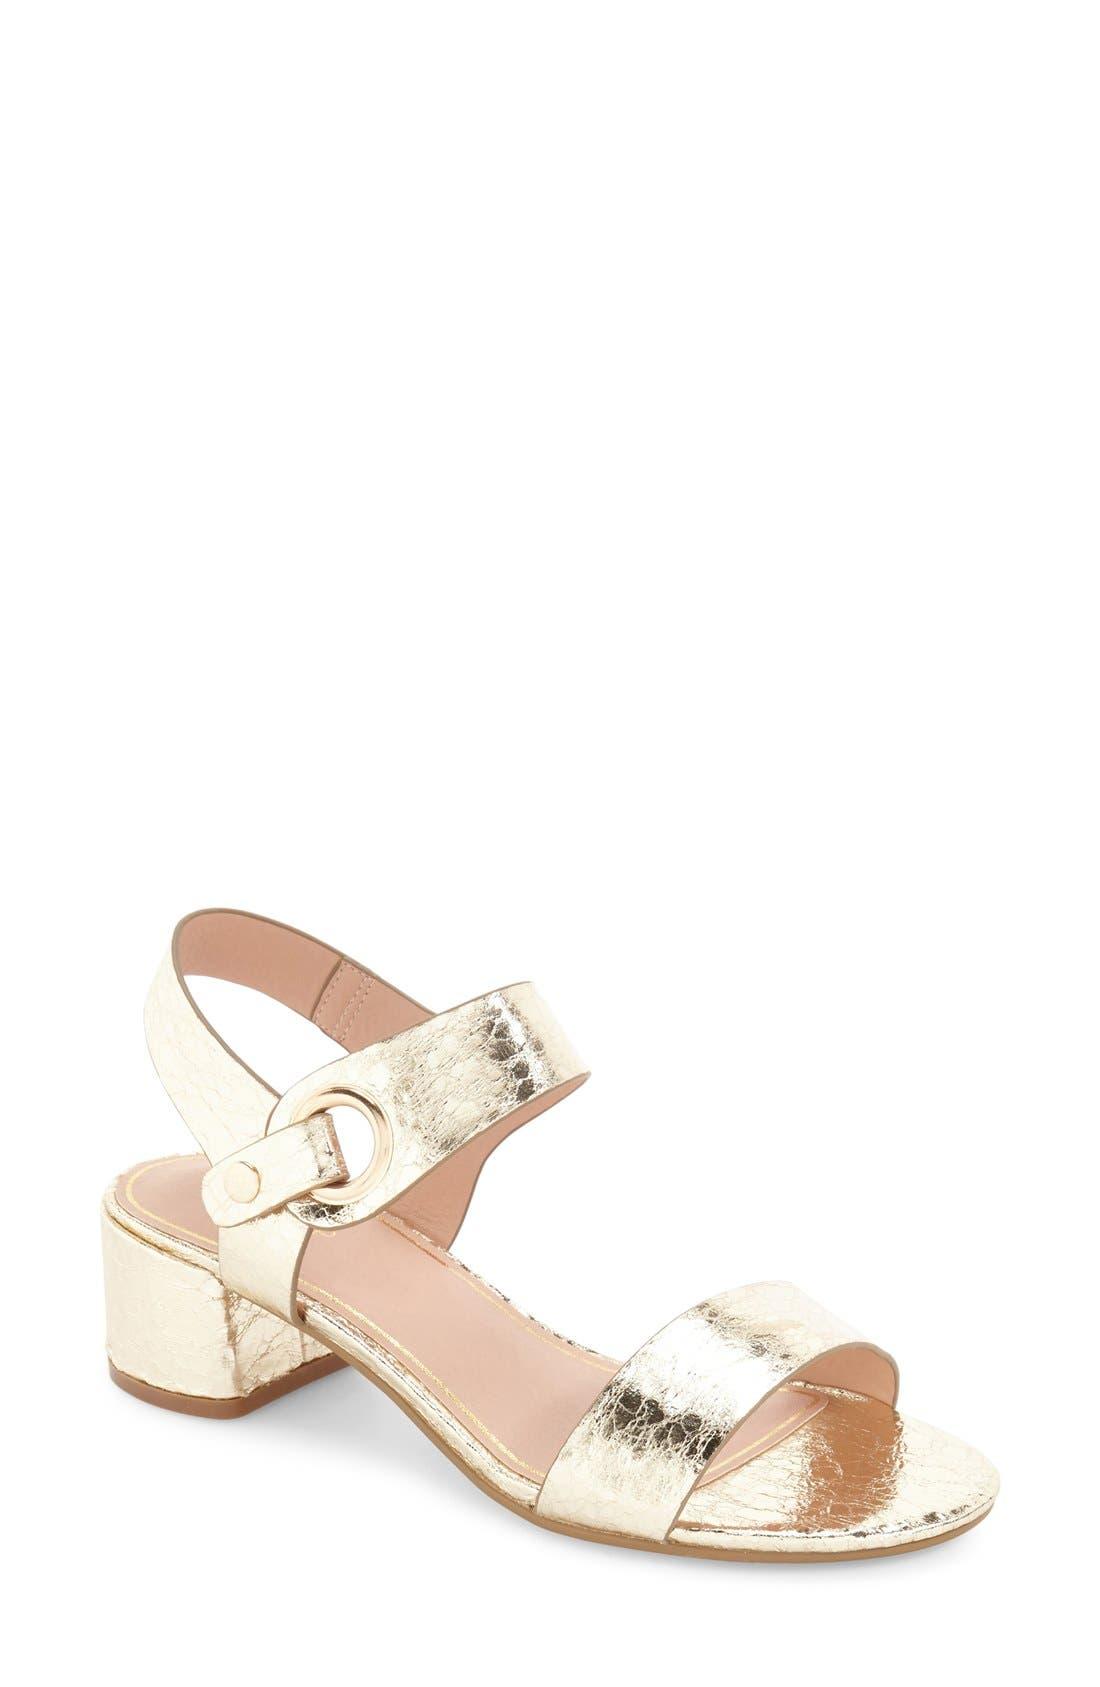 Alternate Image 1 Selected - Topshop 'Dart' Block Heel Sandal (Women)